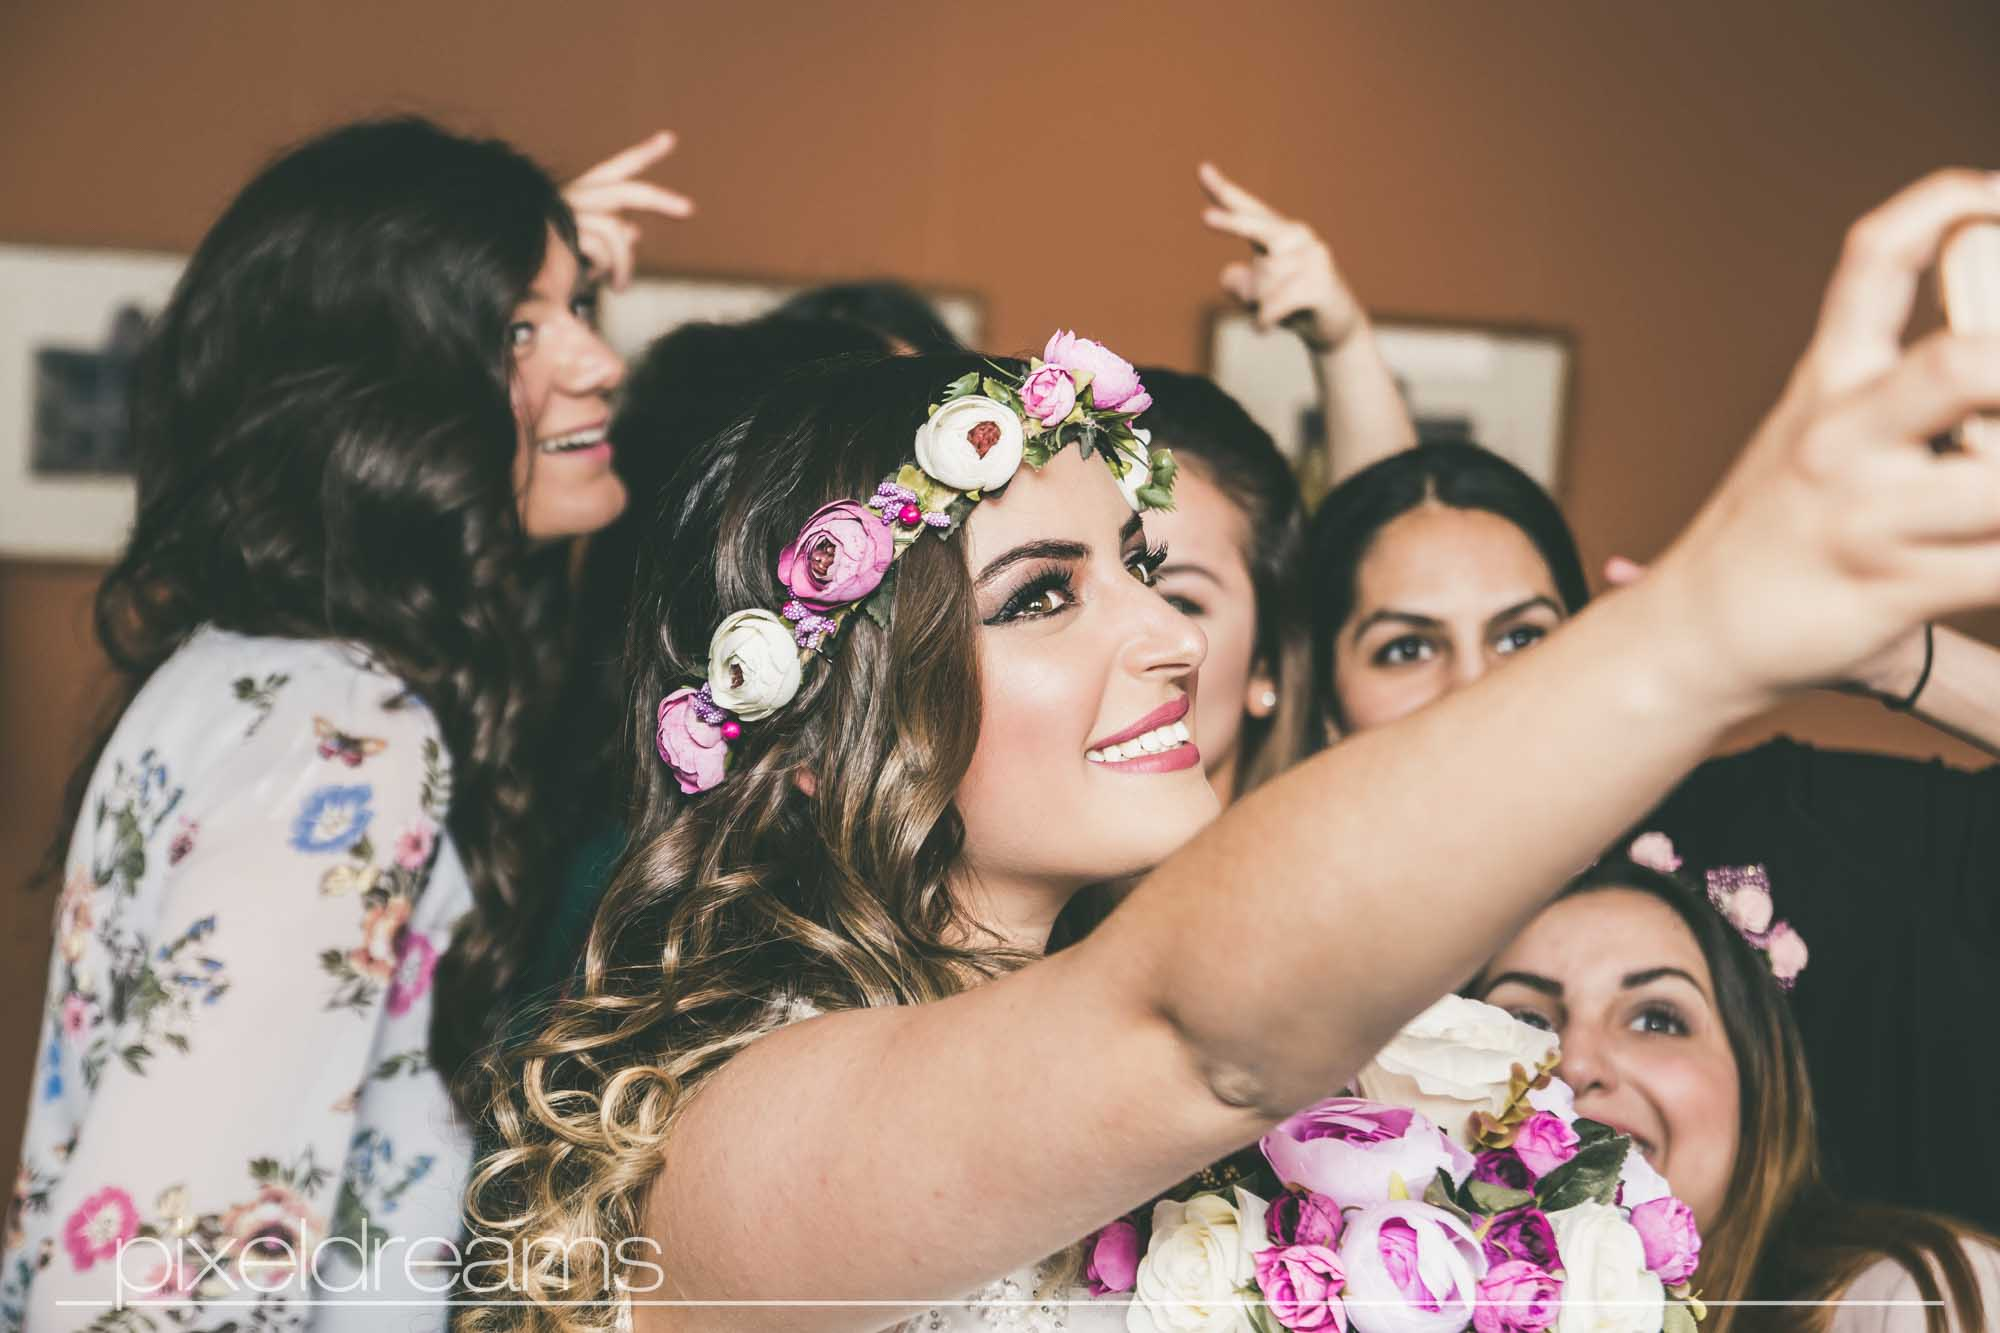 Braut - Brautselfie - Selfie